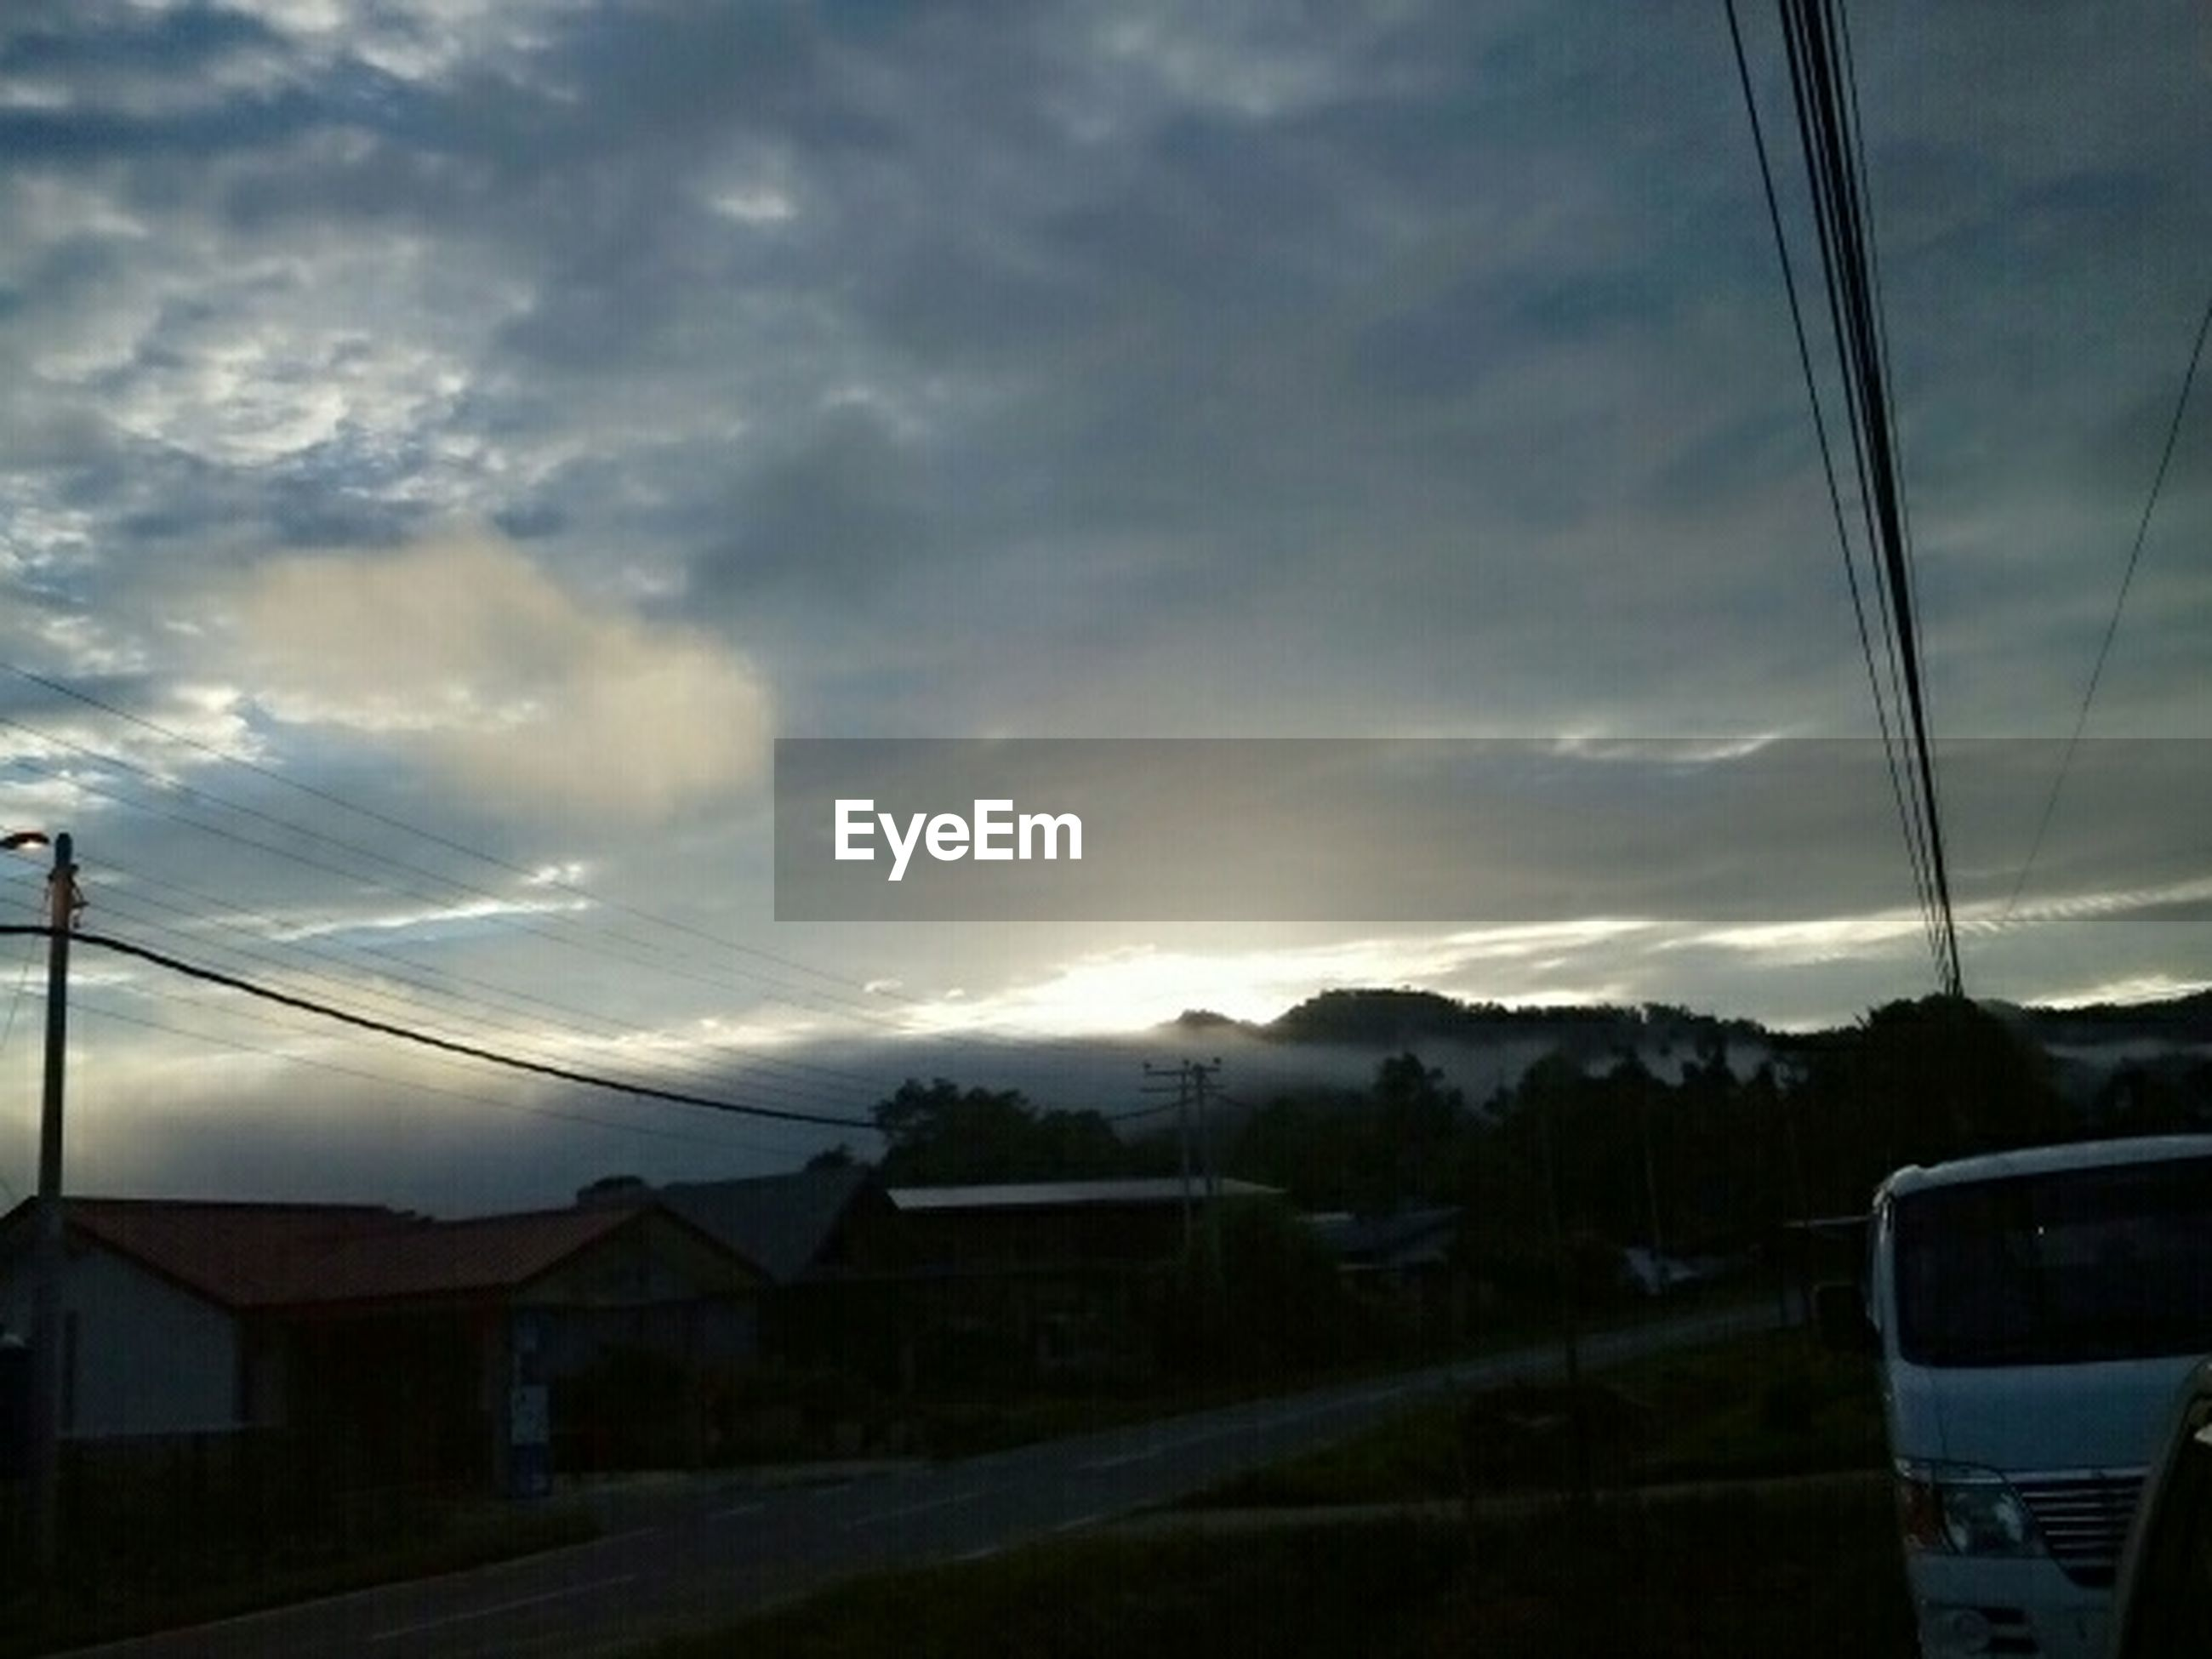 sky, mountain, cloud - sky, sunset, landscape, cloud, road, scenics, transportation, beauty in nature, mountain range, cloudy, nature, house, tranquil scene, tranquility, electricity pylon, silhouette, power line, dusk